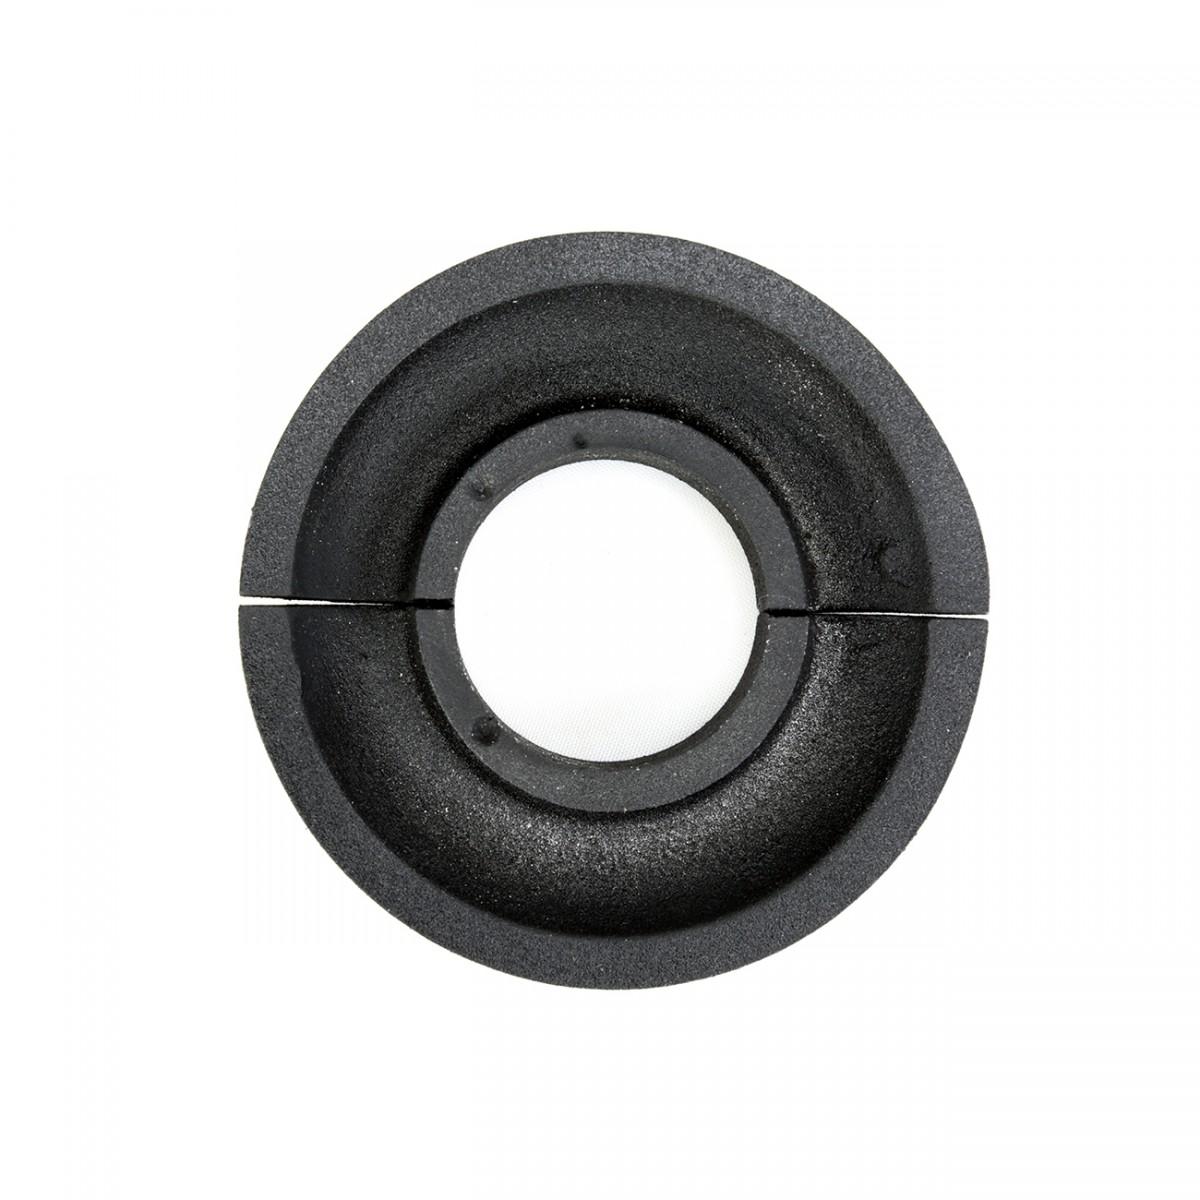 Radiator Flange Black Aluminum Escutcheon 1 14 ID Radiator Flange For Floor Radiator Pipe Hole Covers Black Radiator Flange